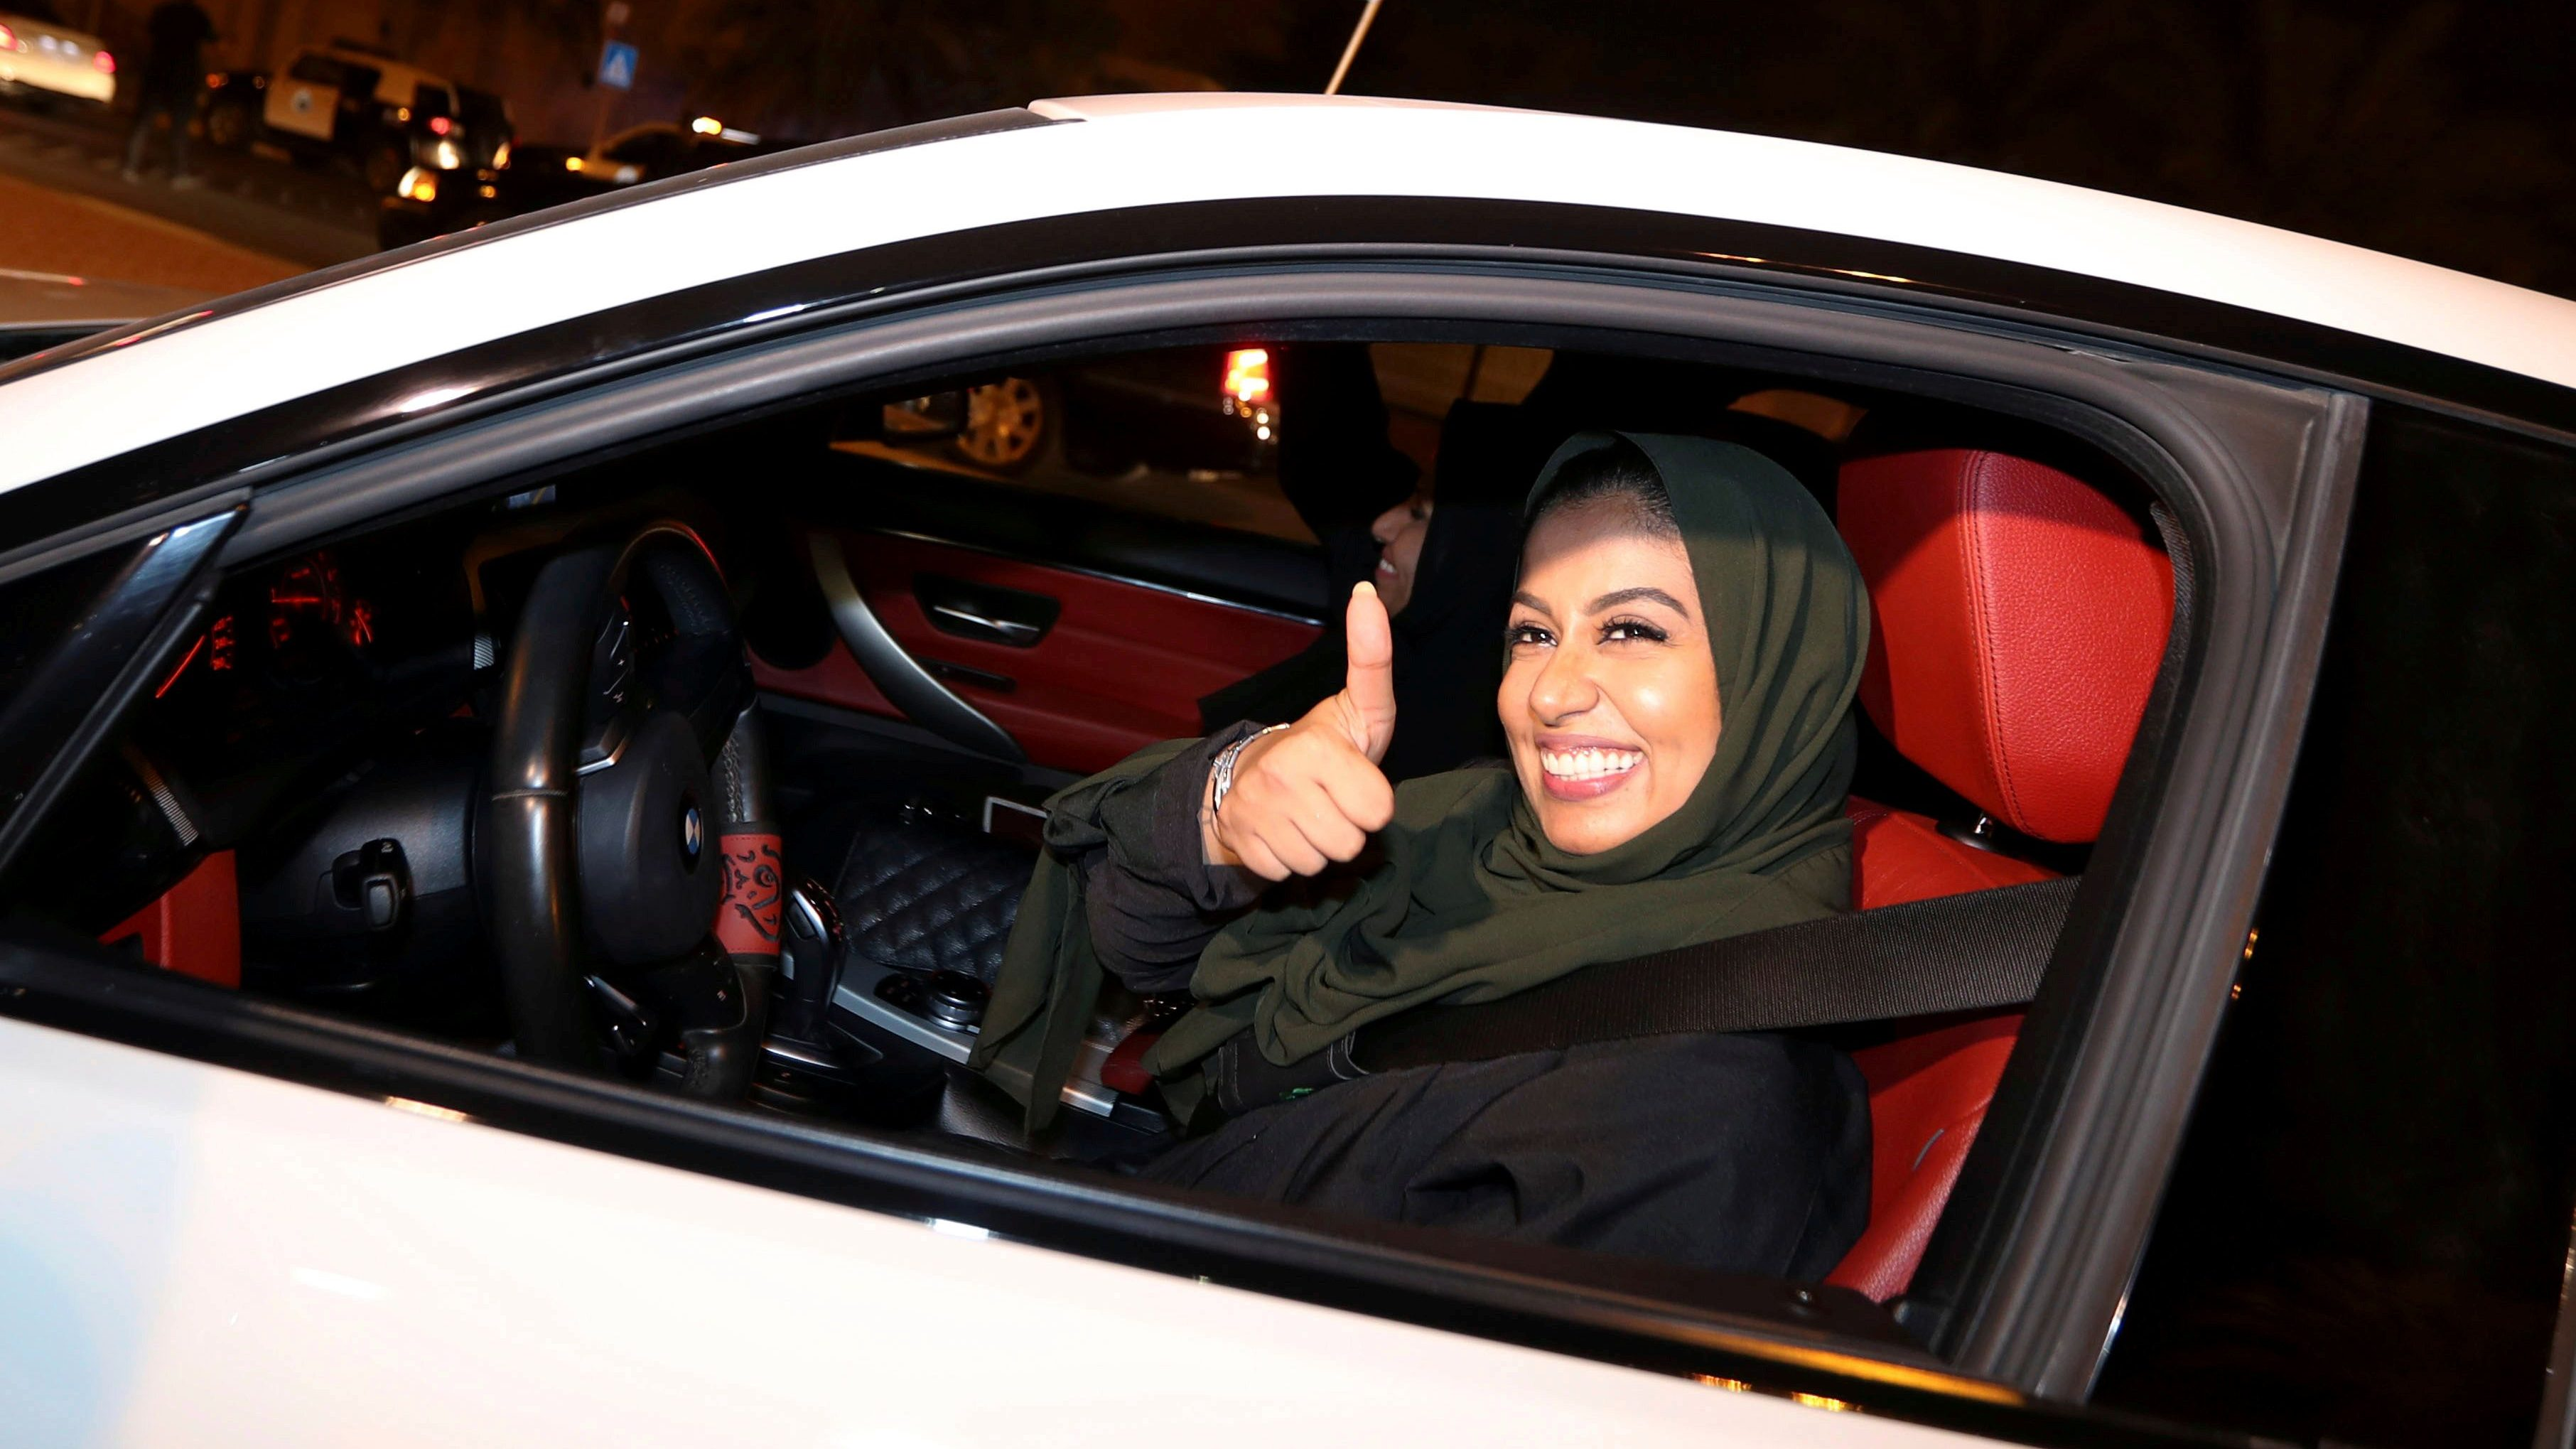 A Saudi woman celebrates as she drives her car in her neighborhood, in Al Khobar,  Saudi Arabia, June 24, 2018.